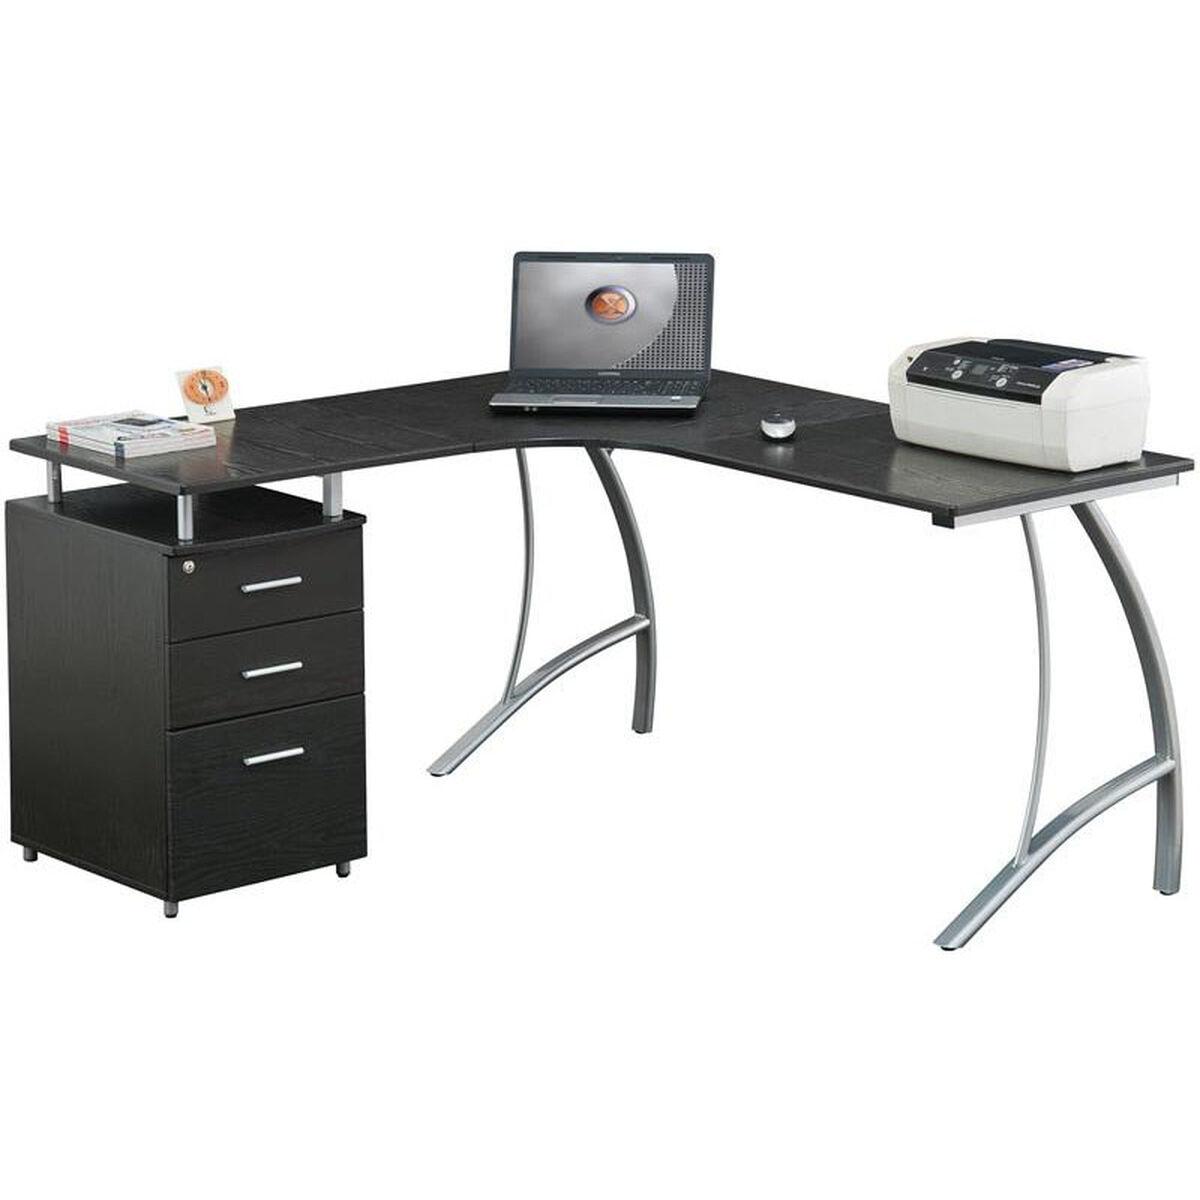 Our Techni Mobili L Shape Corner Desk With File Cabinet Espresso Is On Now